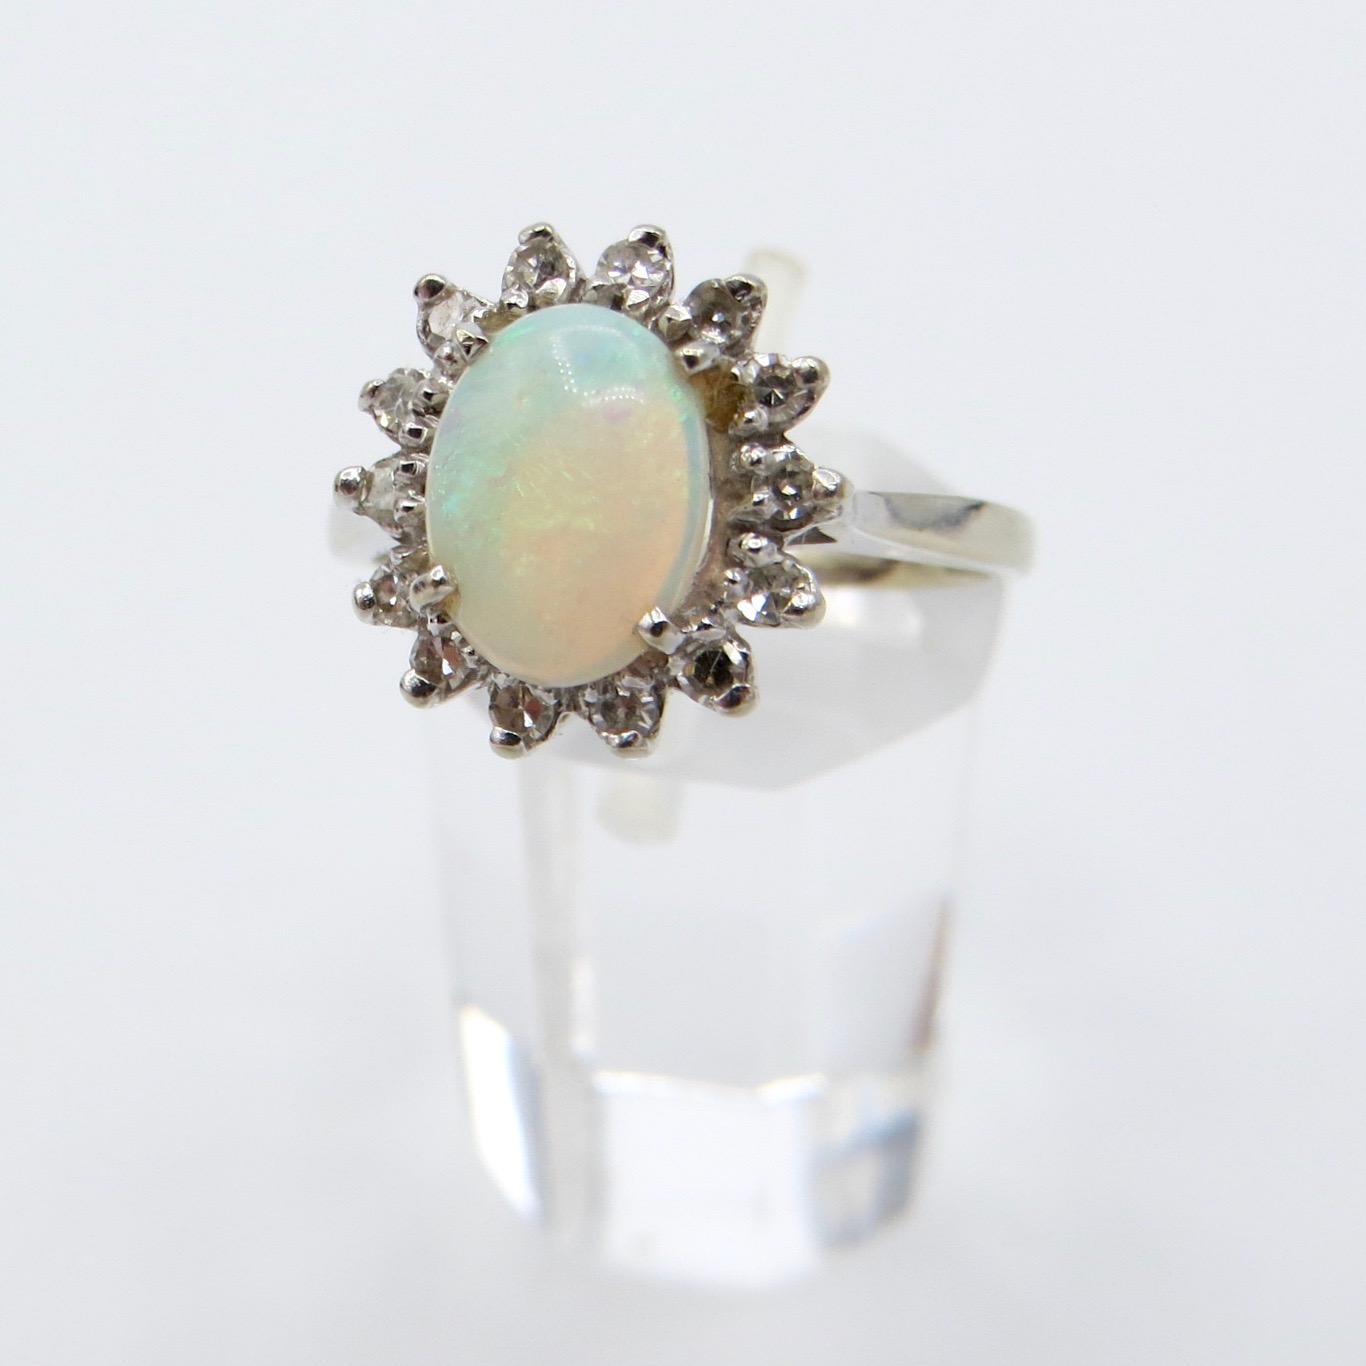 14kt Gold, Opal & Diamond Ring